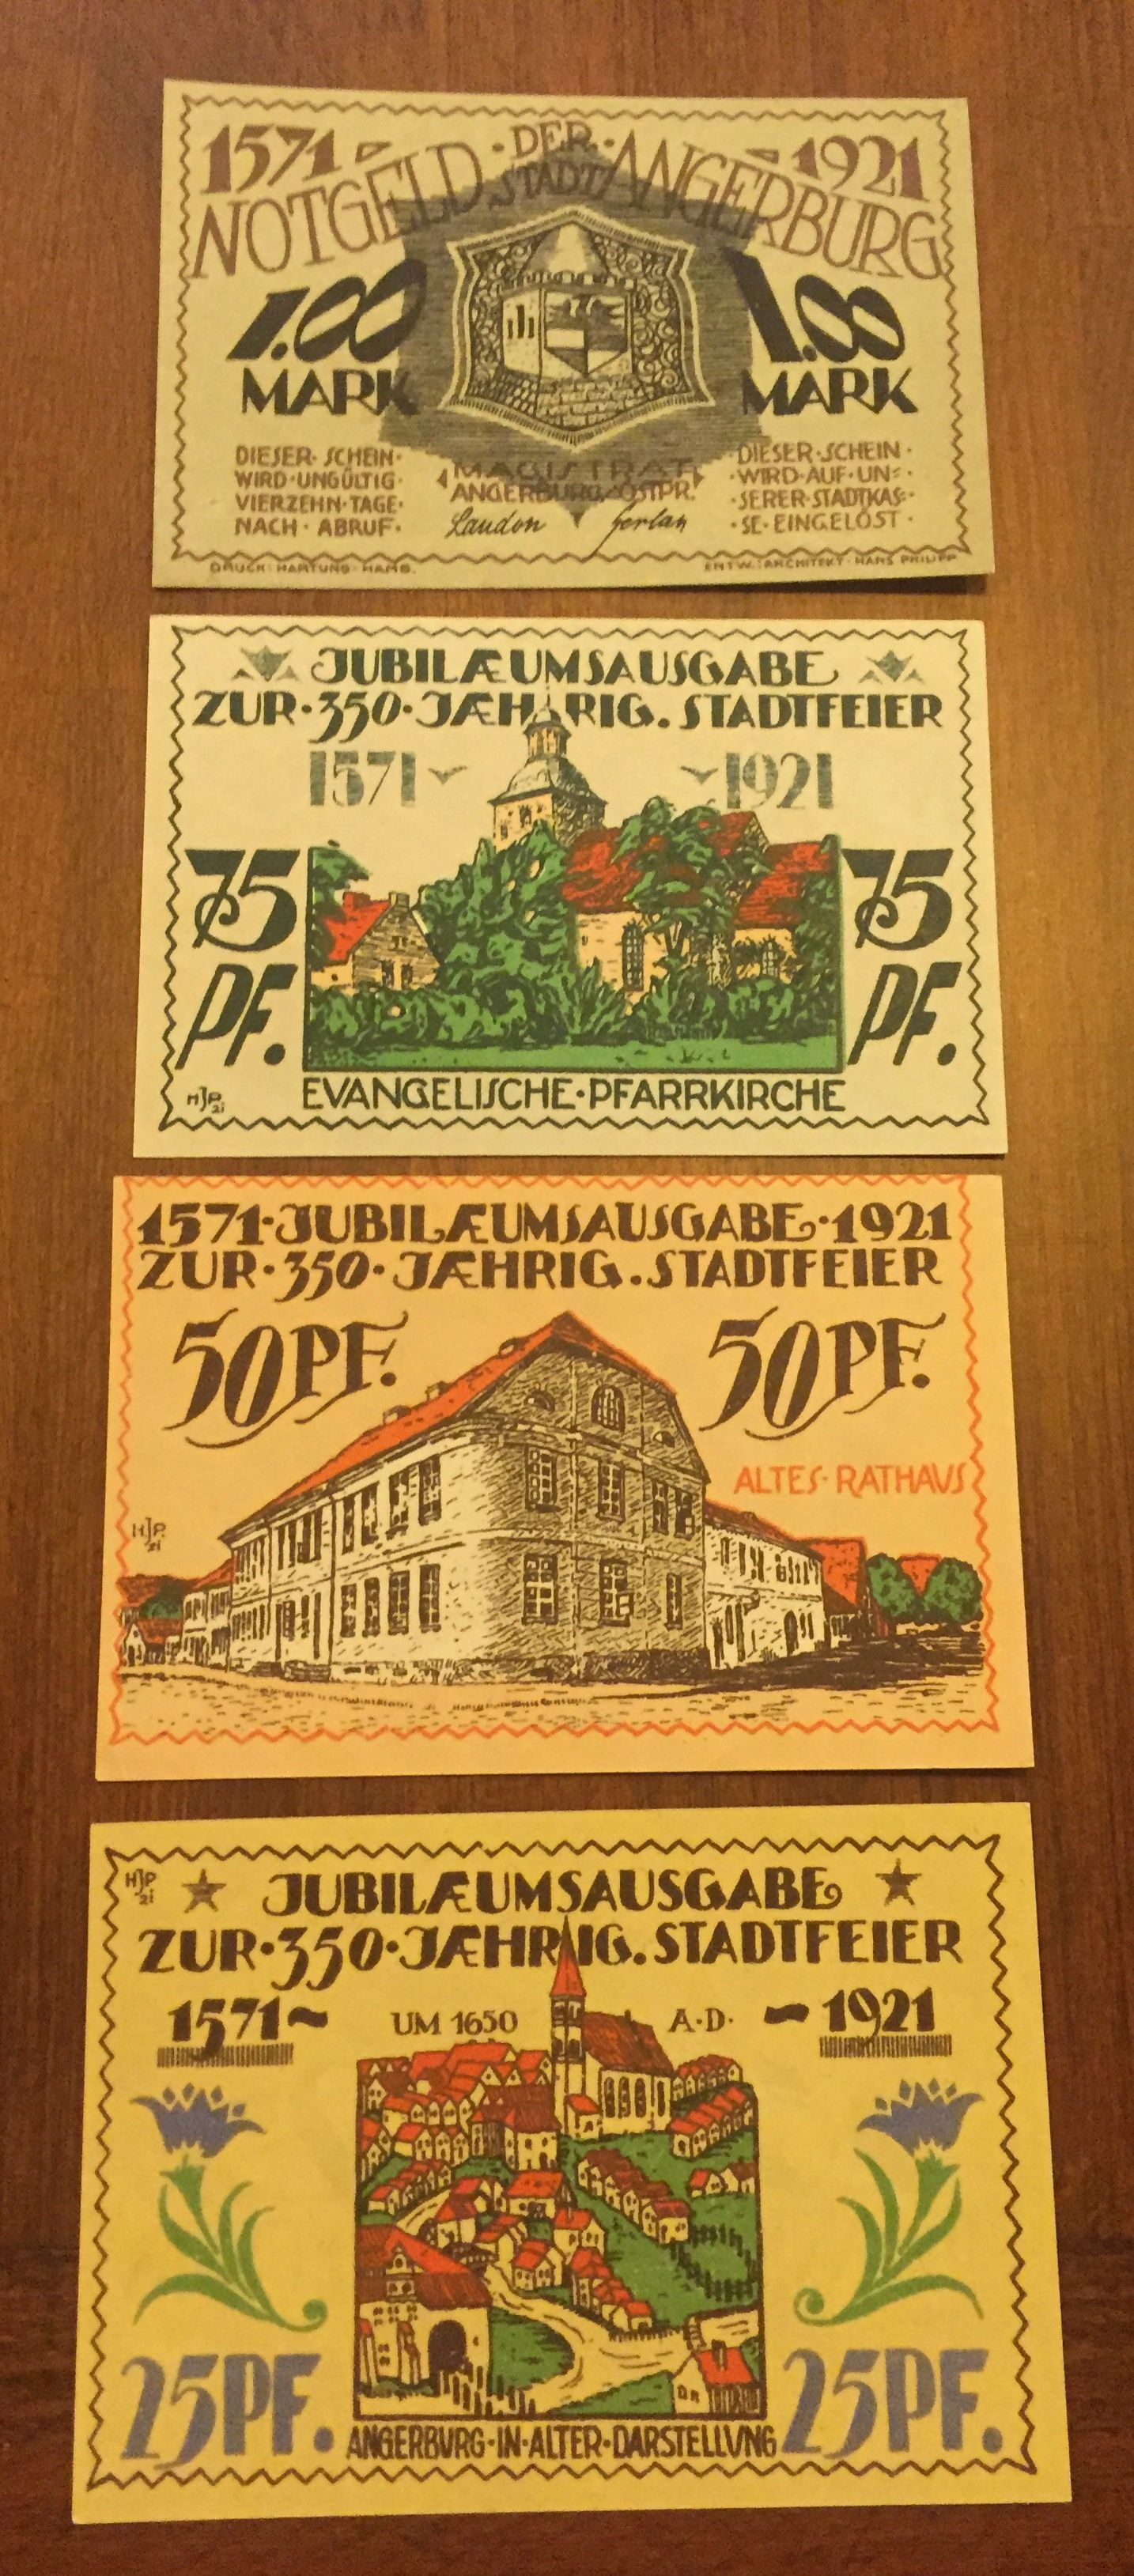 Mert Erdumlu Banknot Arsivi Para Banknot Koleksiyon Numismatik Numizmatik Banknotkoleksiyonu Collection Banknote Banknotecollection Numismat Bank Notes